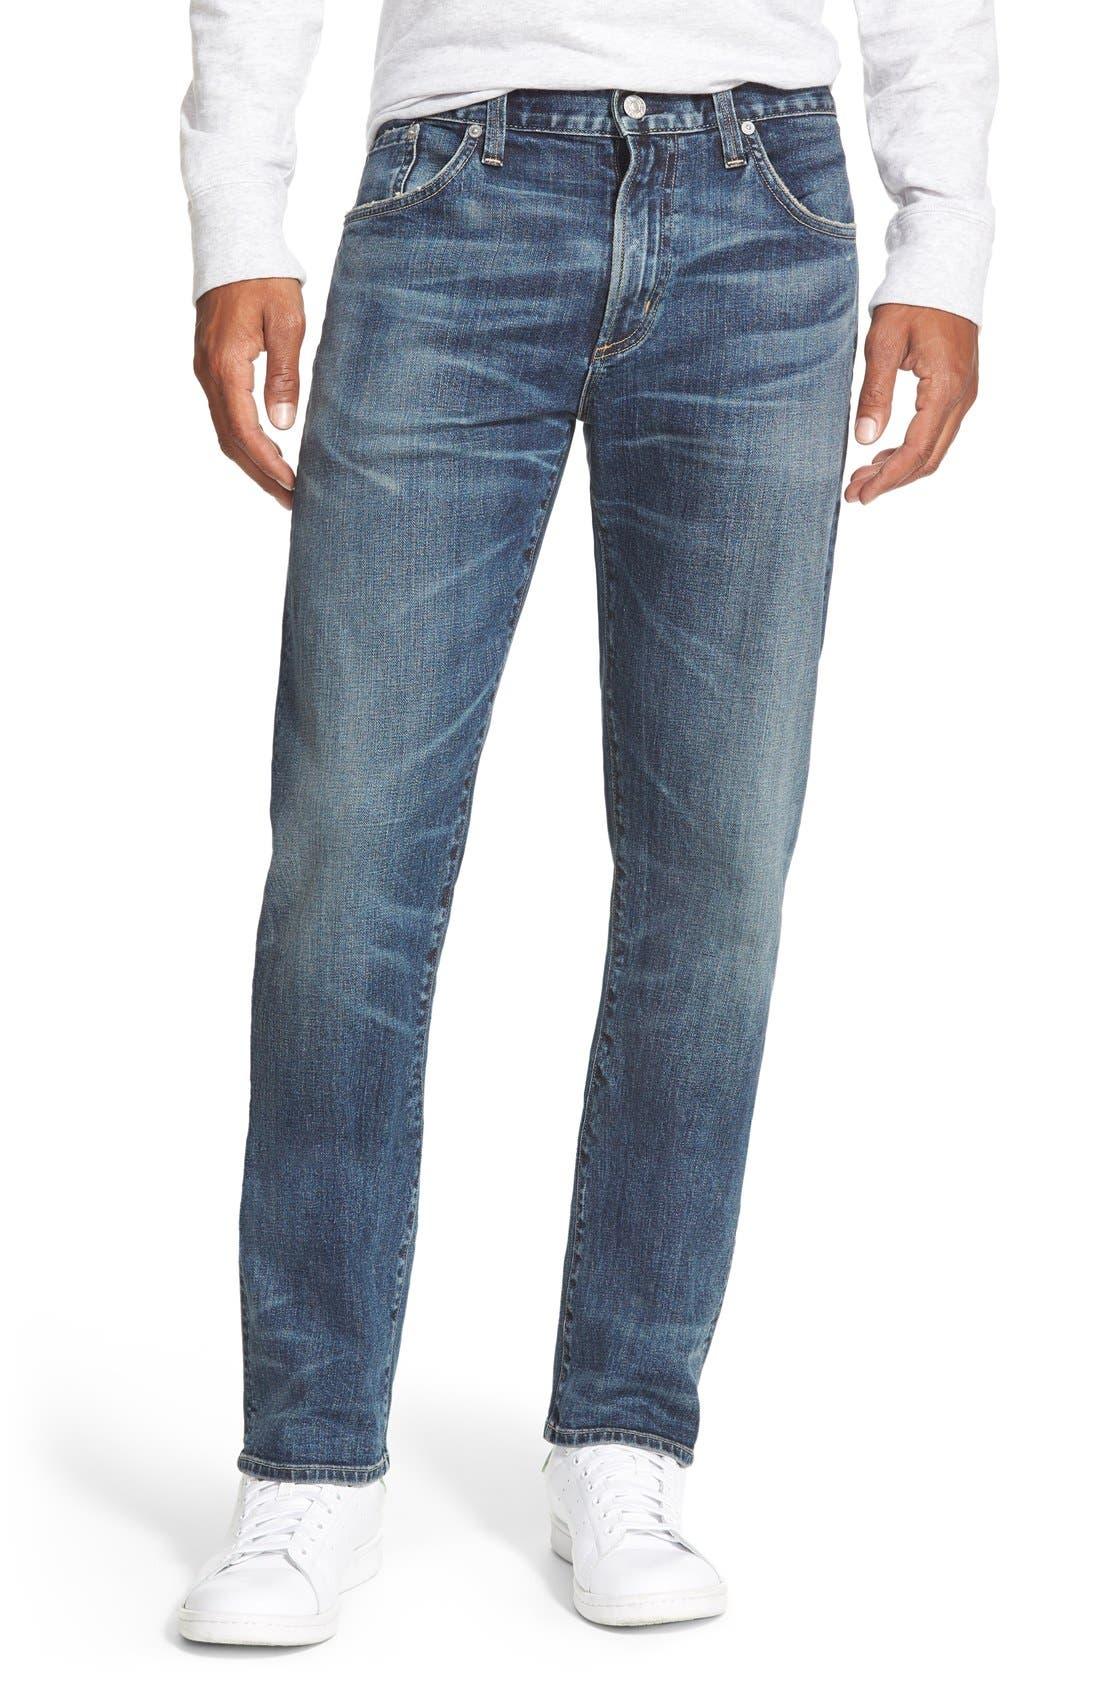 Alternate Image 1 Selected - Citizens of Humanity 'Core' Slim Straight Leg Jeans (Lenoir)